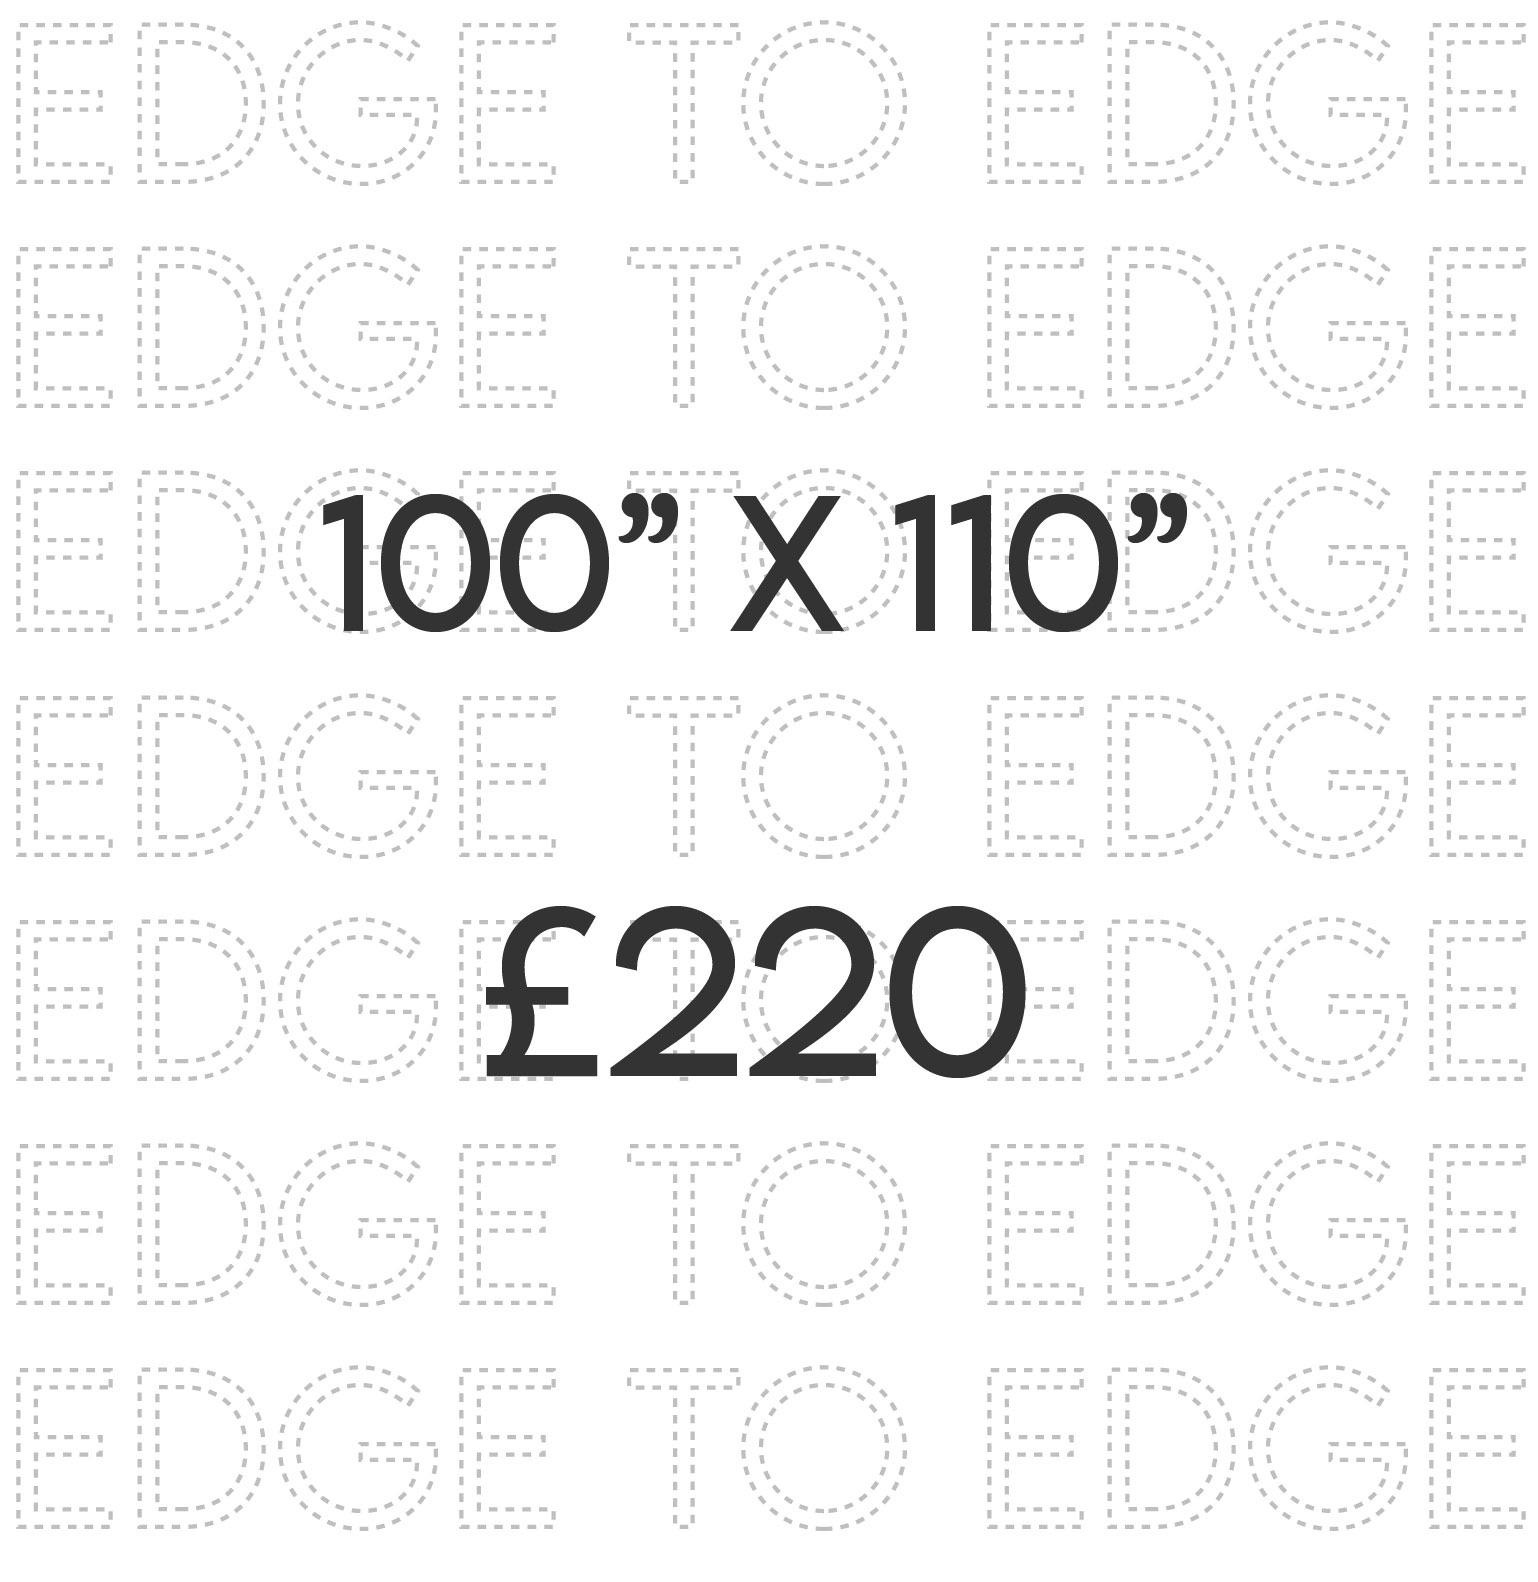 100 x110